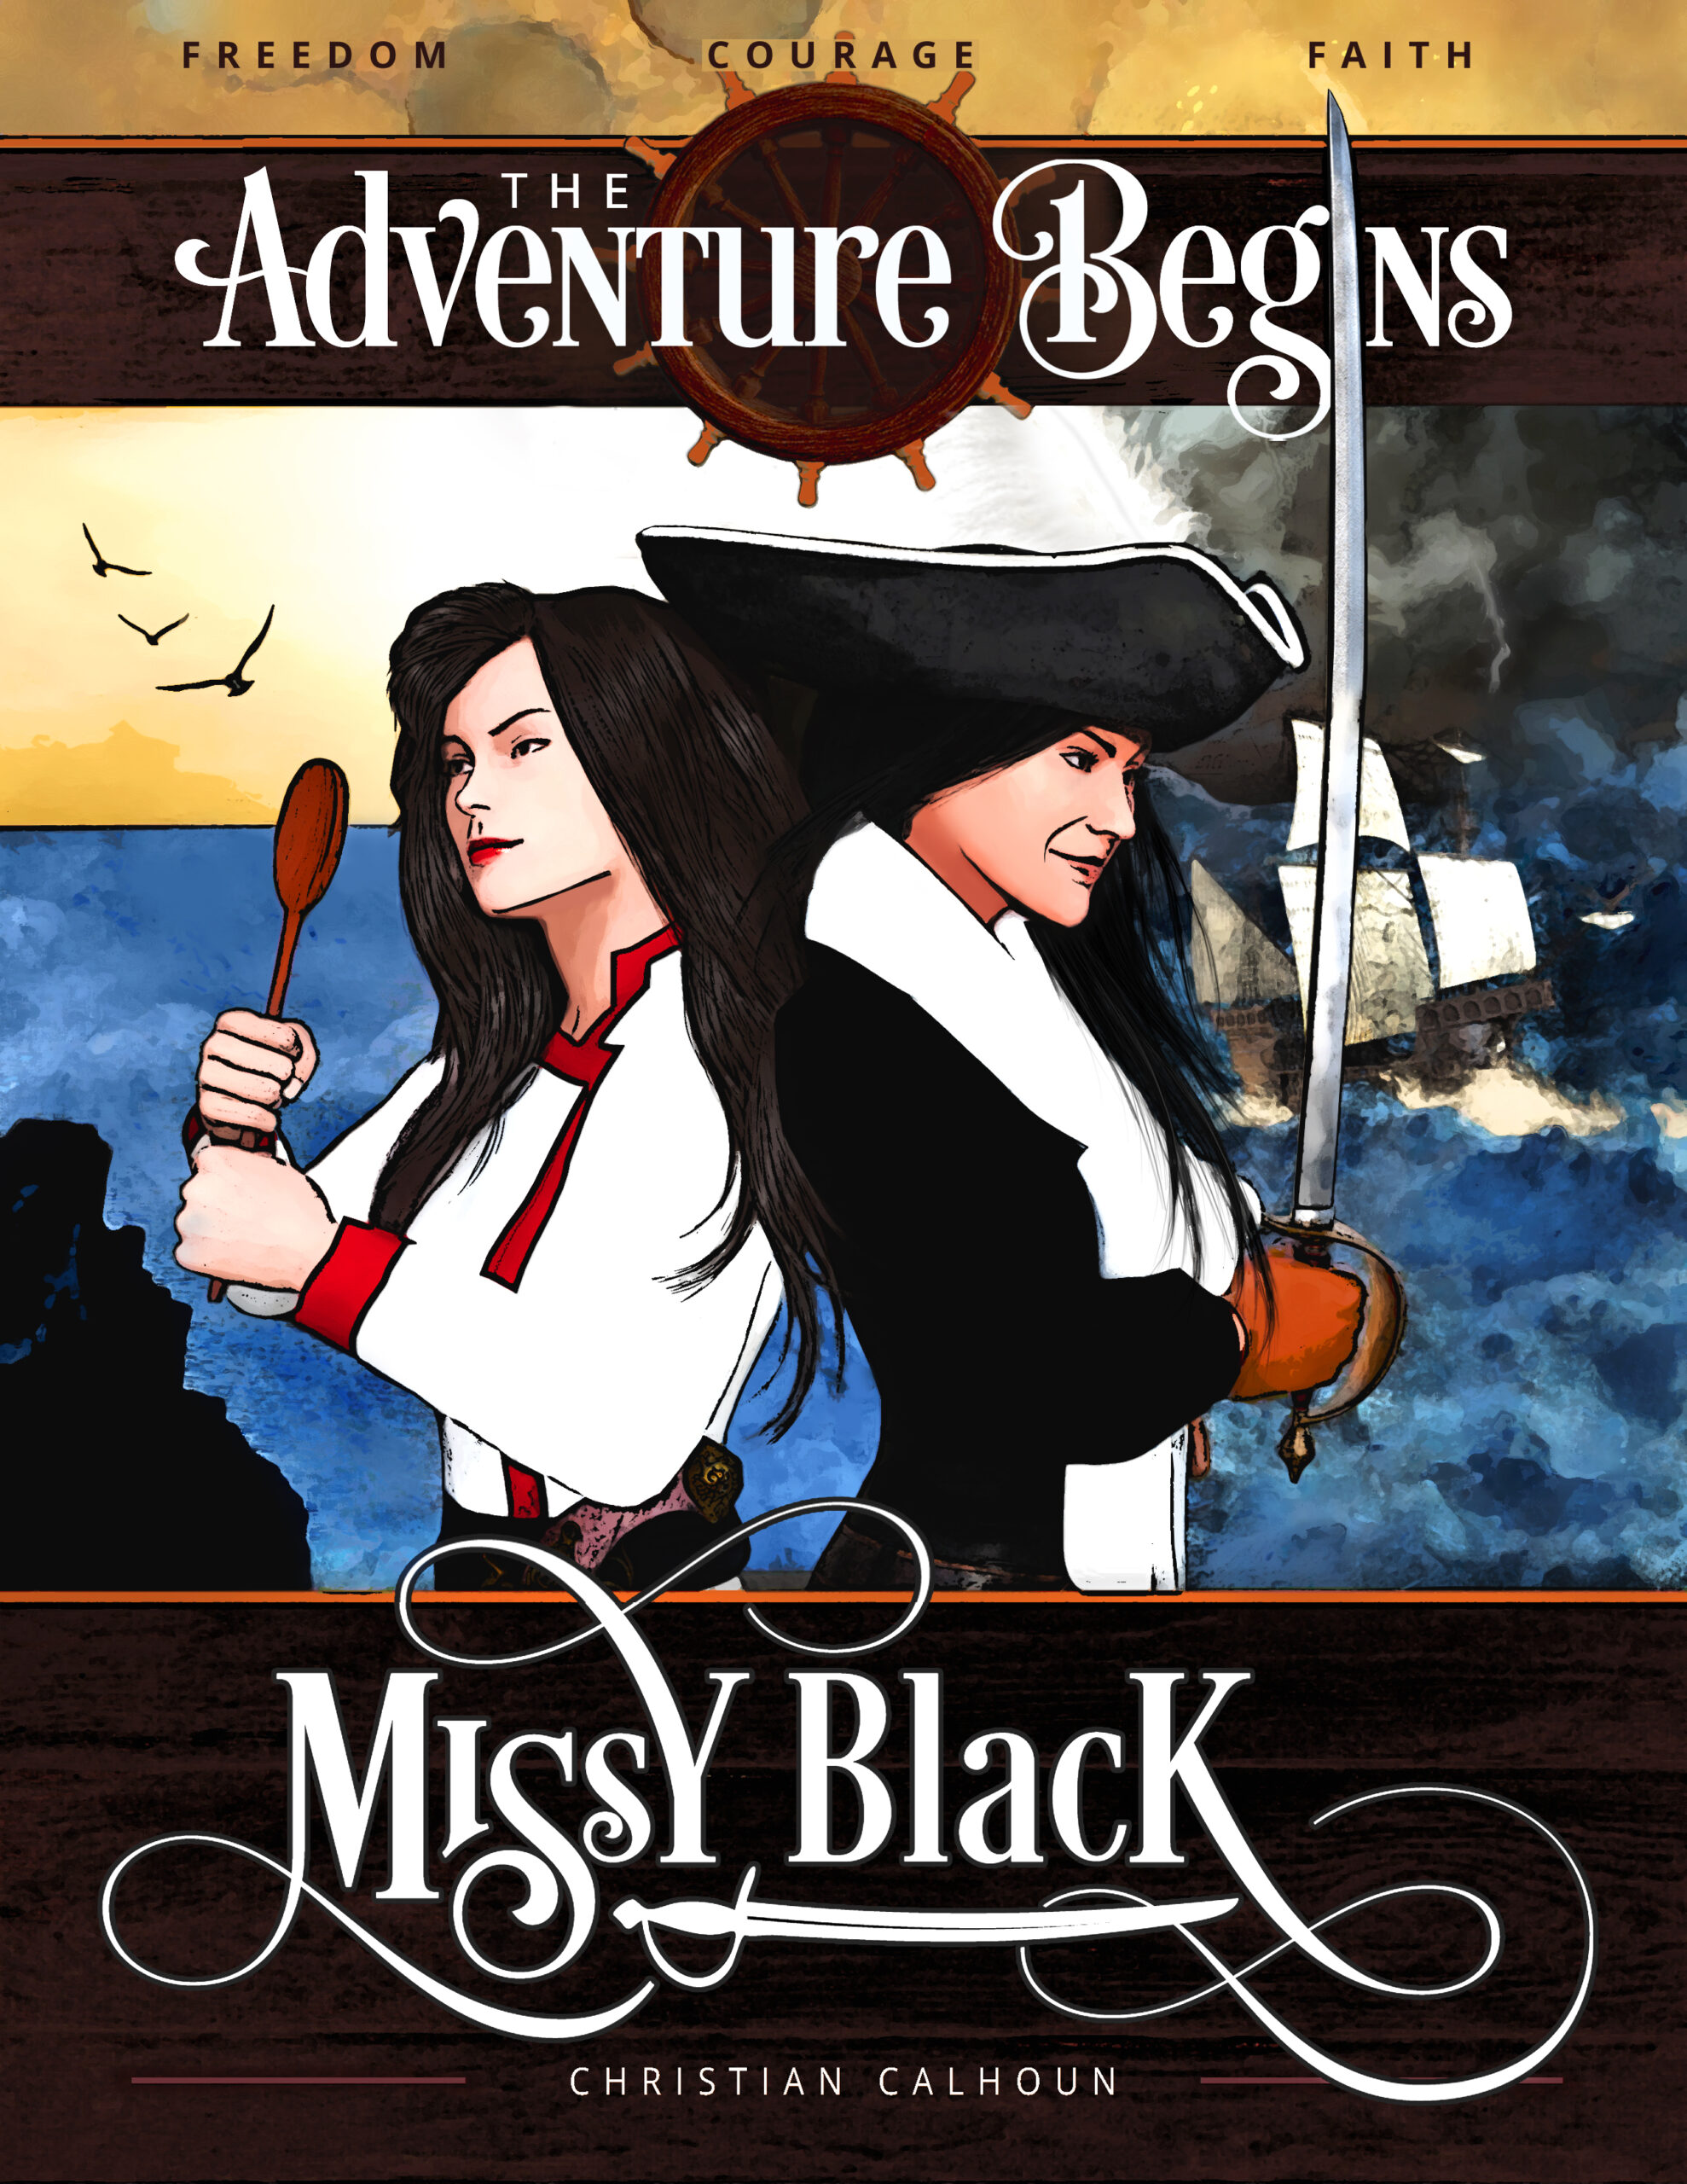 Missy Black Book Cover Design Novel Series